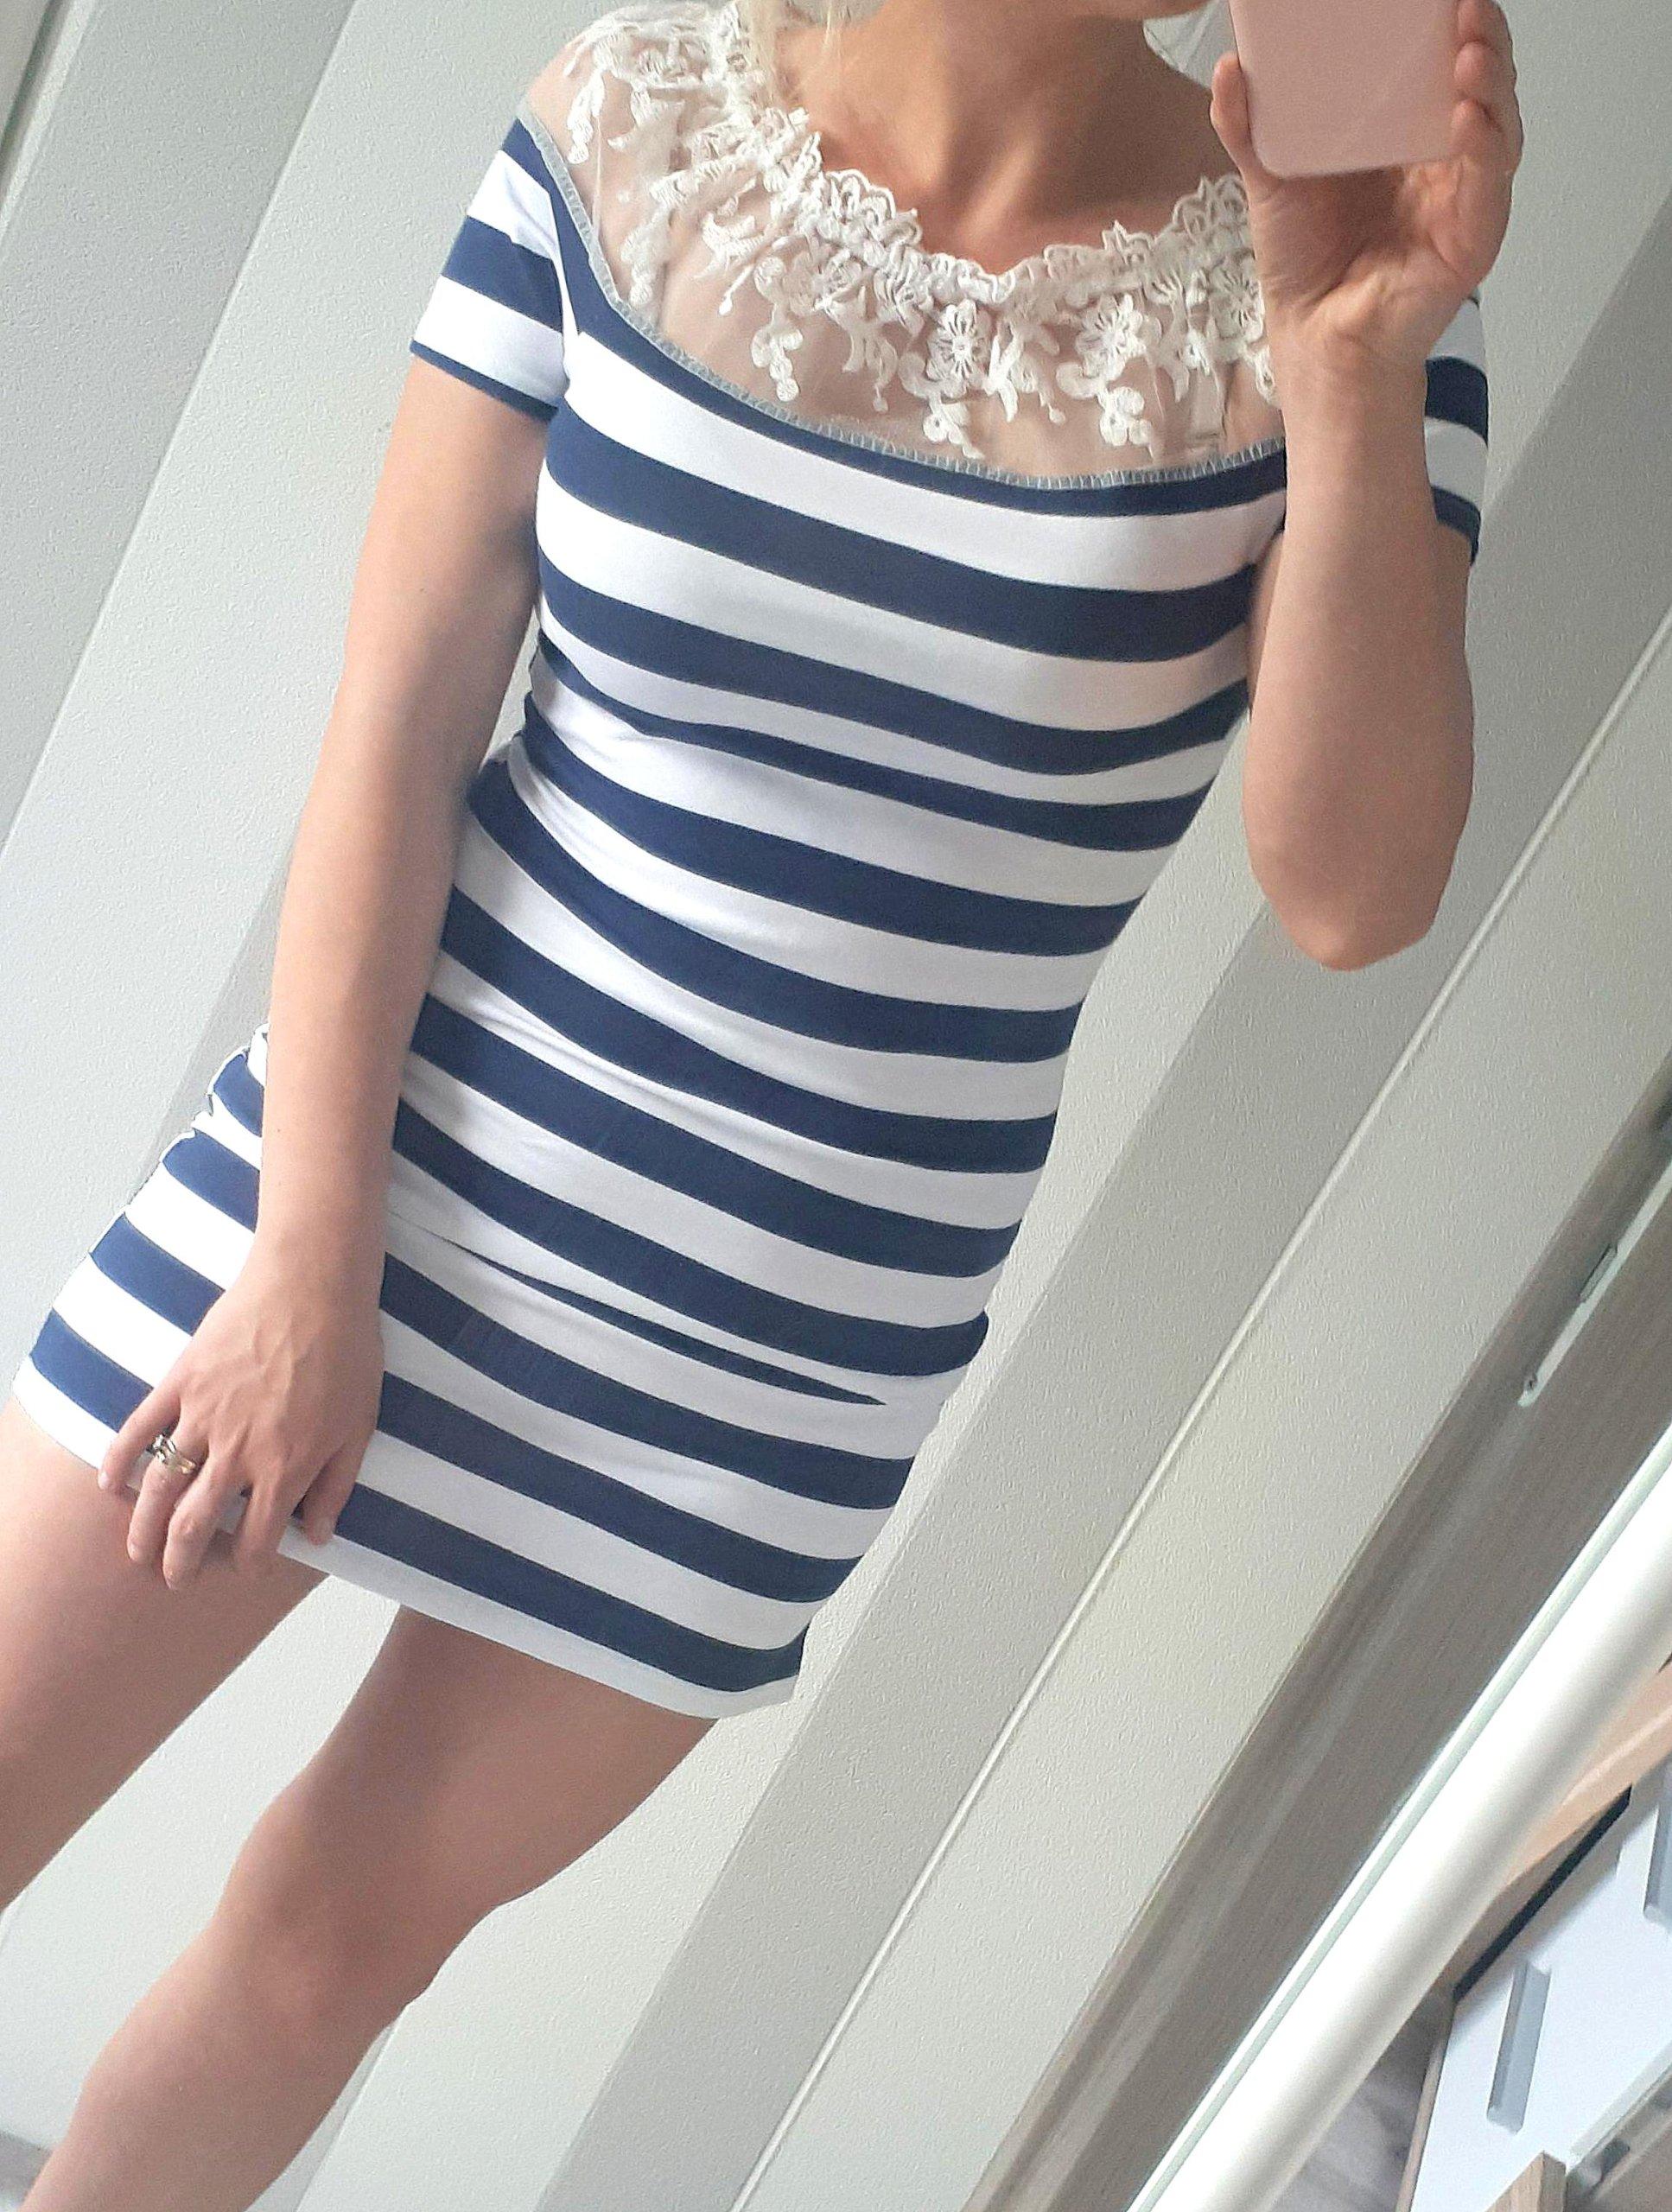 6a3e7ef85d Śliczna sukienka paski marina koronka uniwersalna - 7390278084 - oficjalne  archiwum allegro